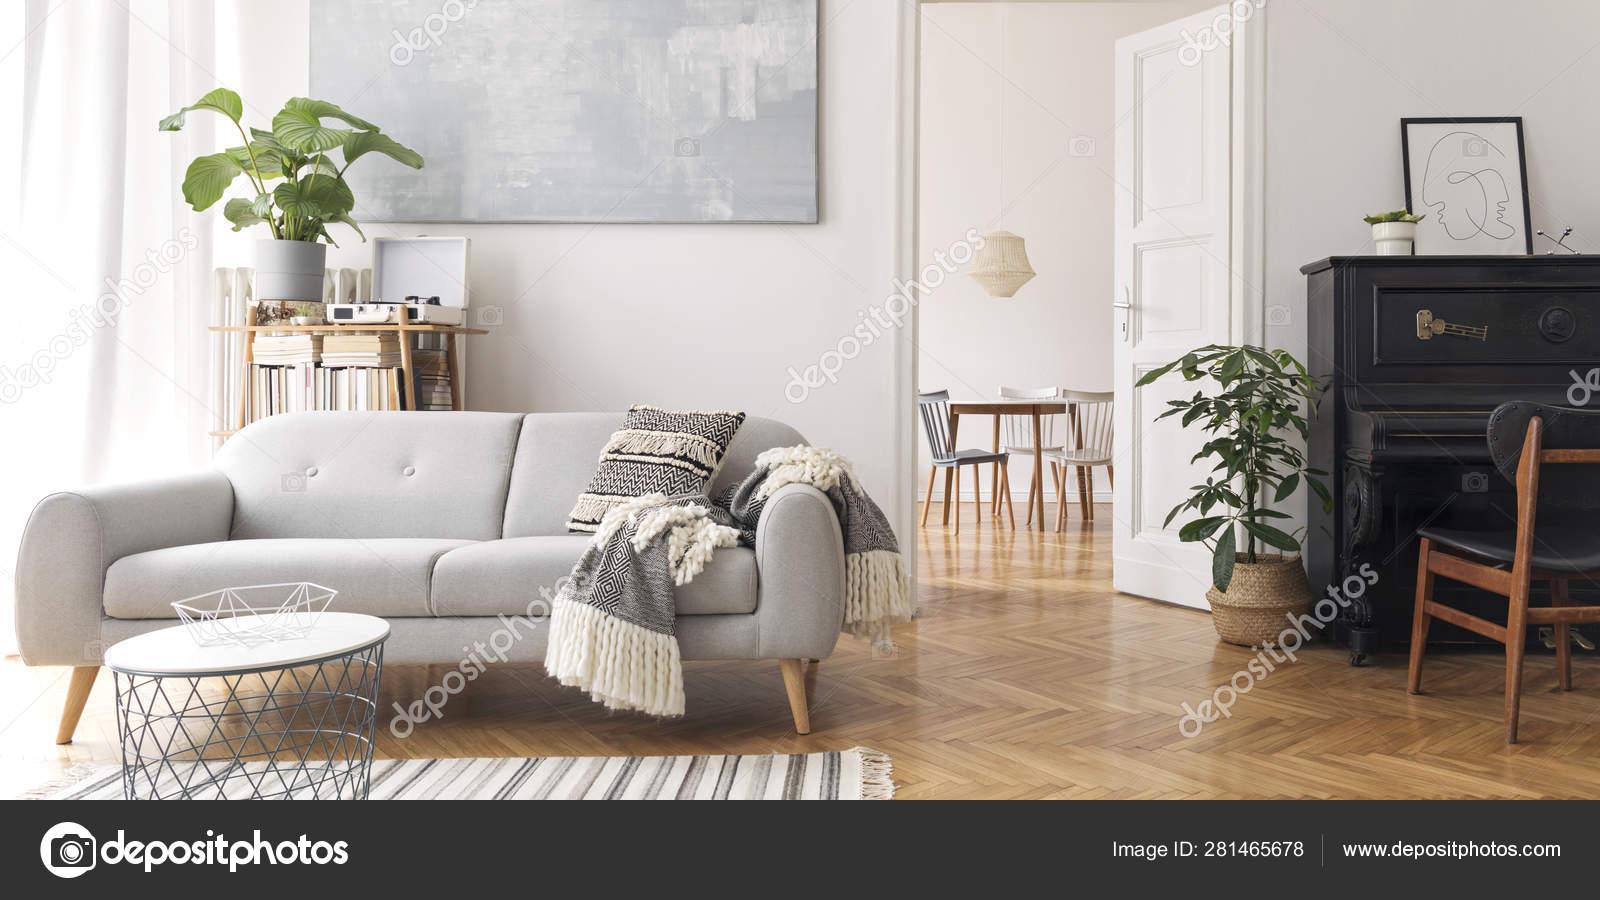 Modern Scandianvian Decor Living Room Design Sofa Elegant Blanket Coffee Stock Photo Image By C Followtheflow 281465678